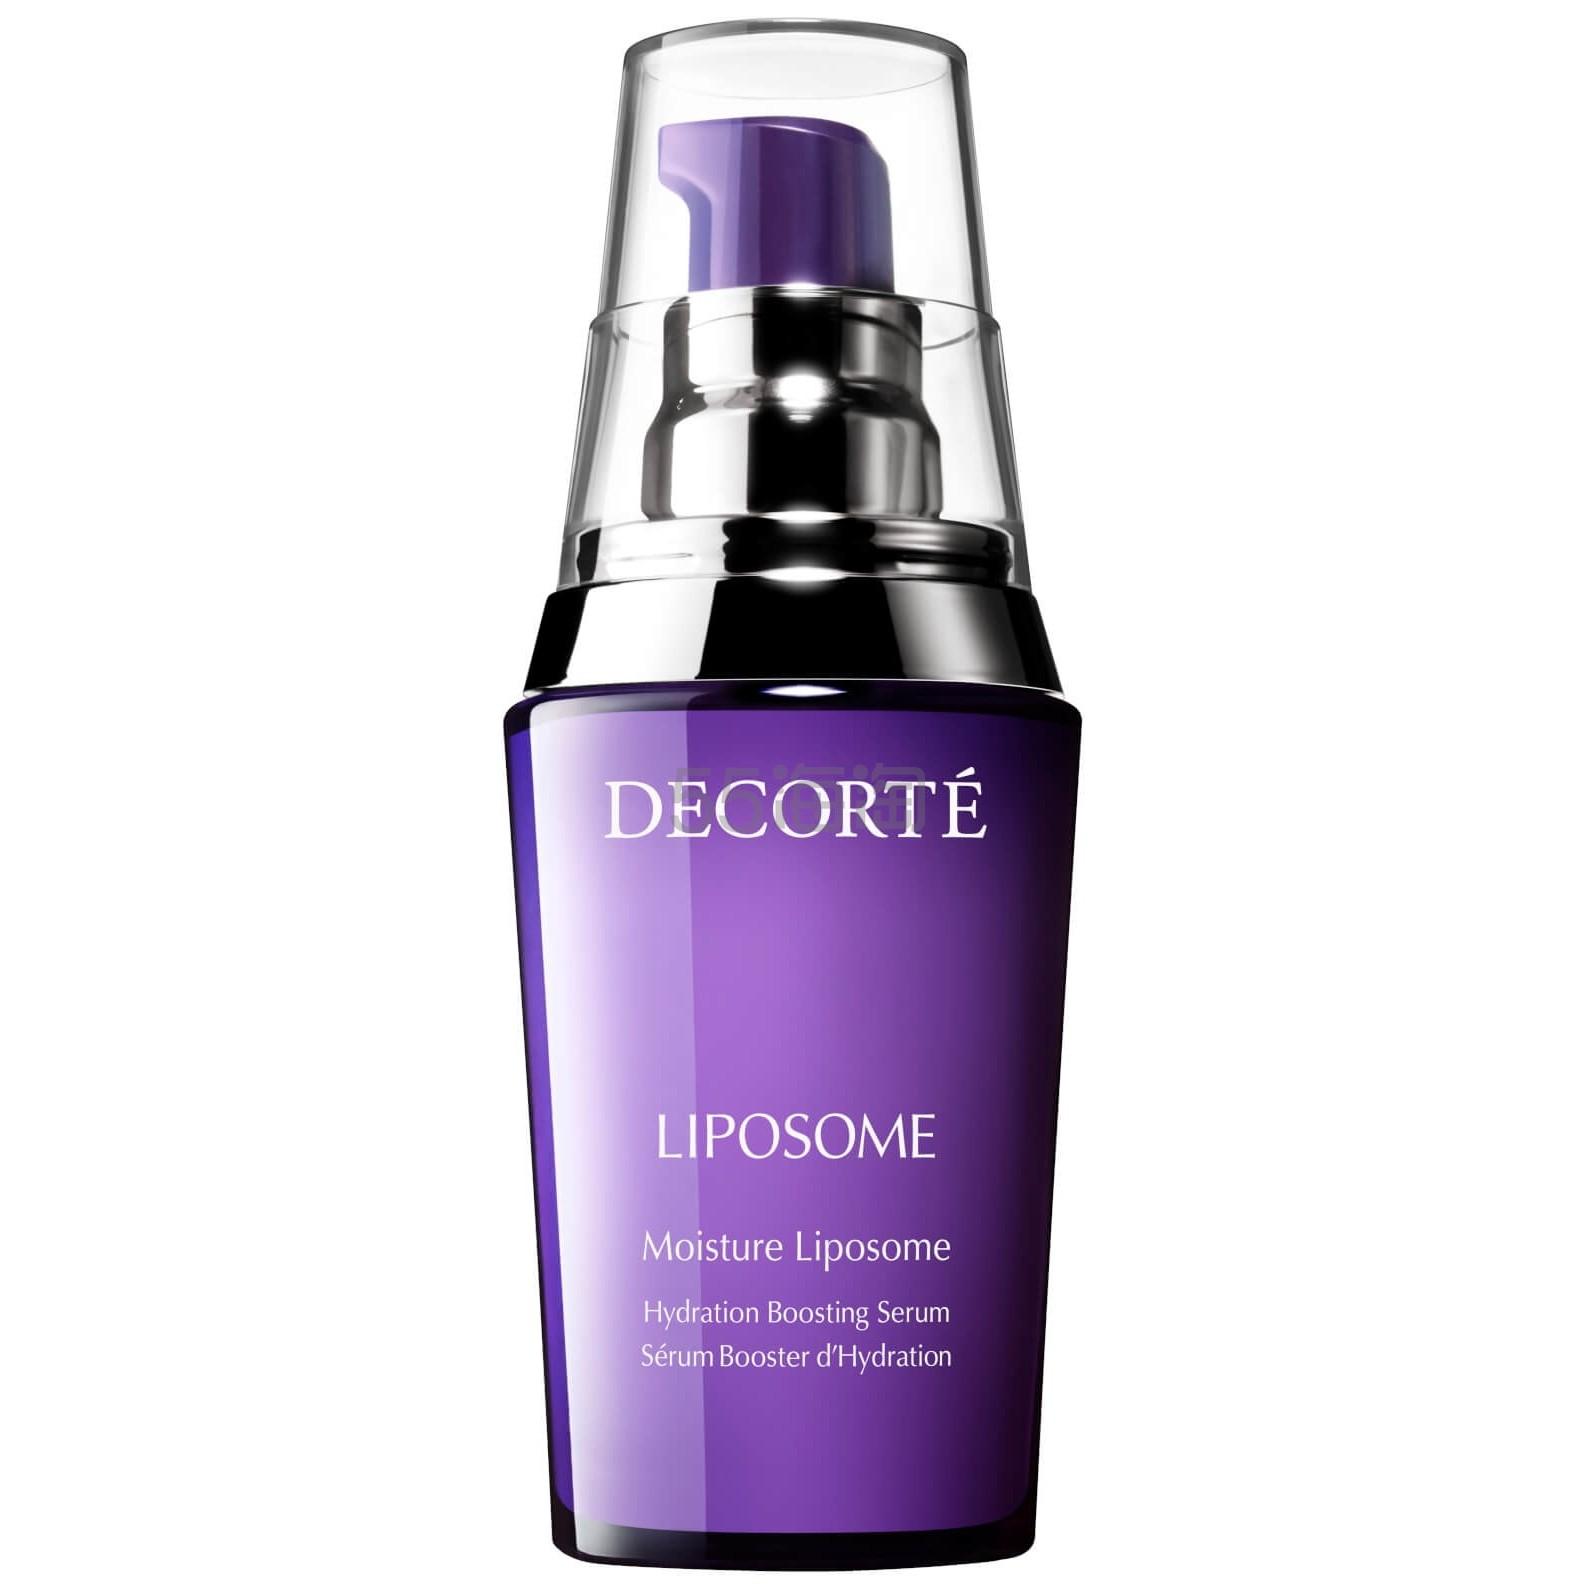 decorte  黛珂小紫瓶精华 40ml (约528元) - 海淘优惠海淘折扣|55海淘网